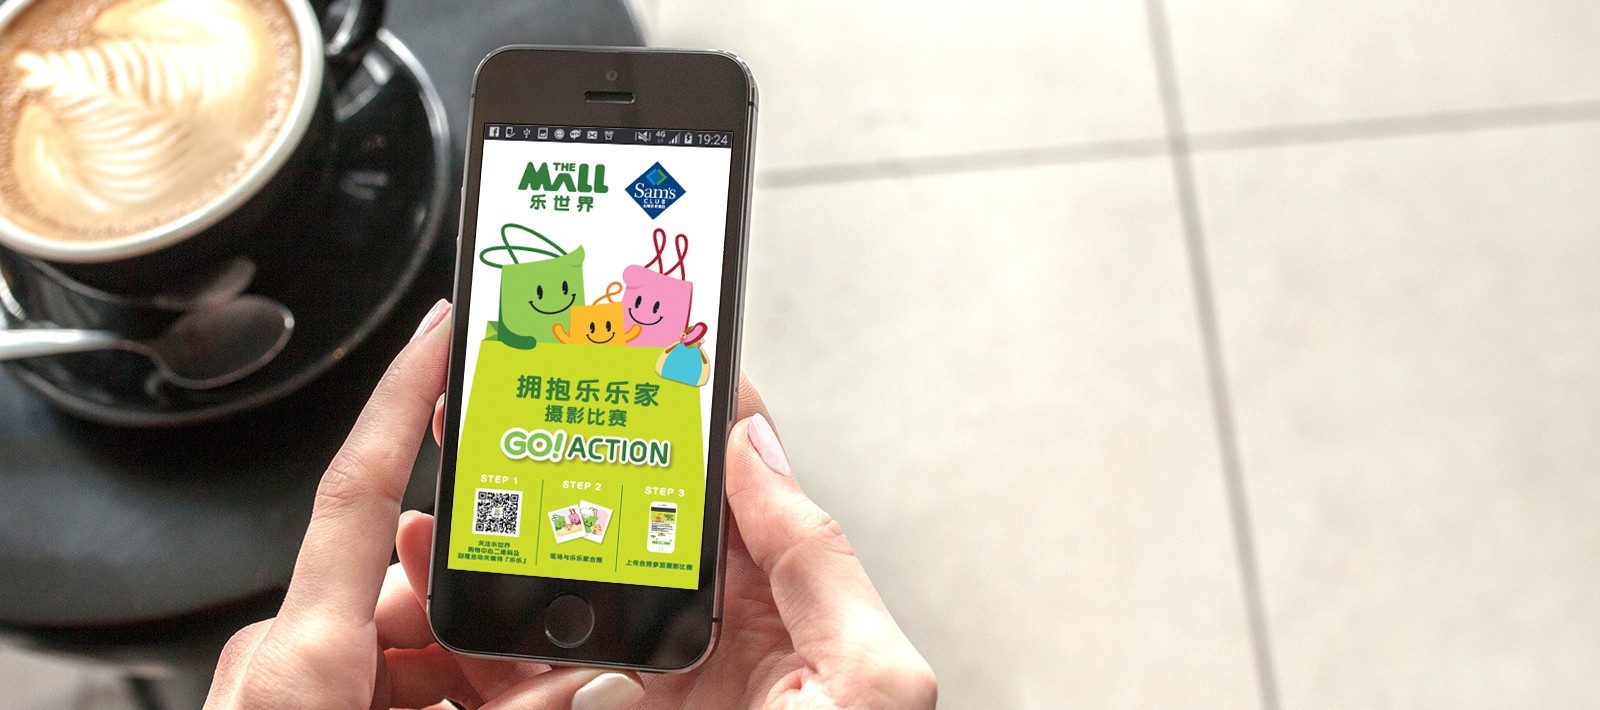 social media marketing for Walmart the mall